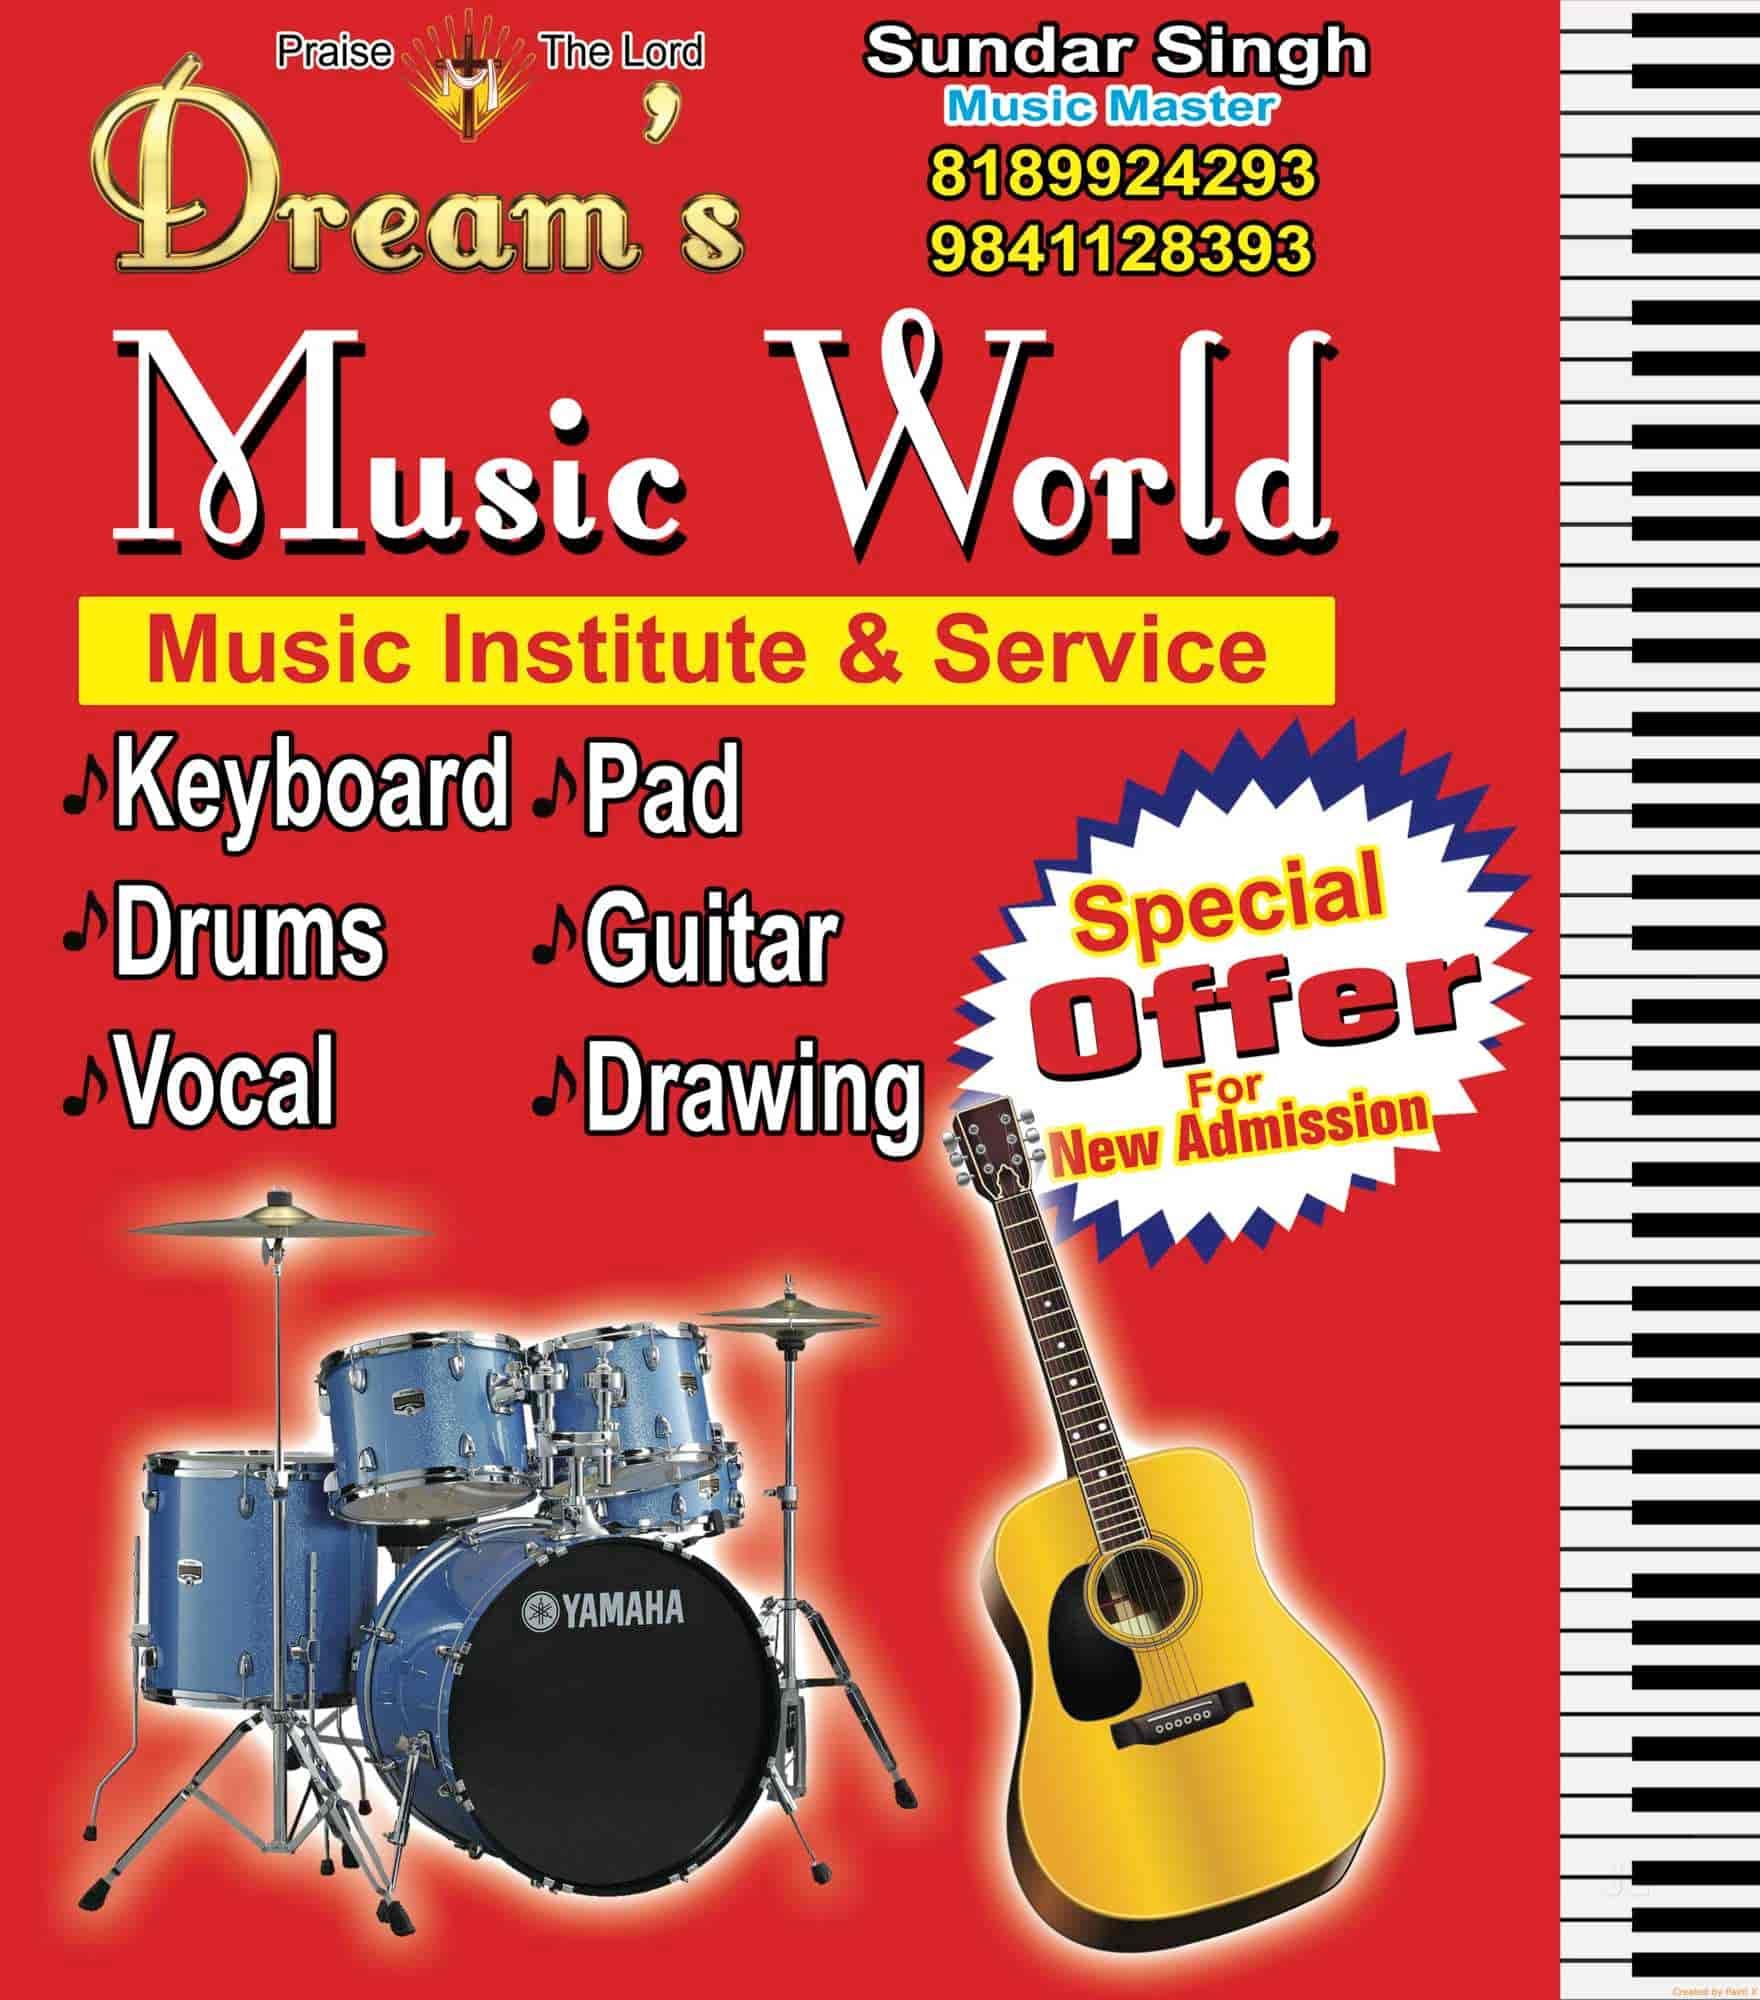 Dreams Music World - Music Institute & Service, Madhavaram